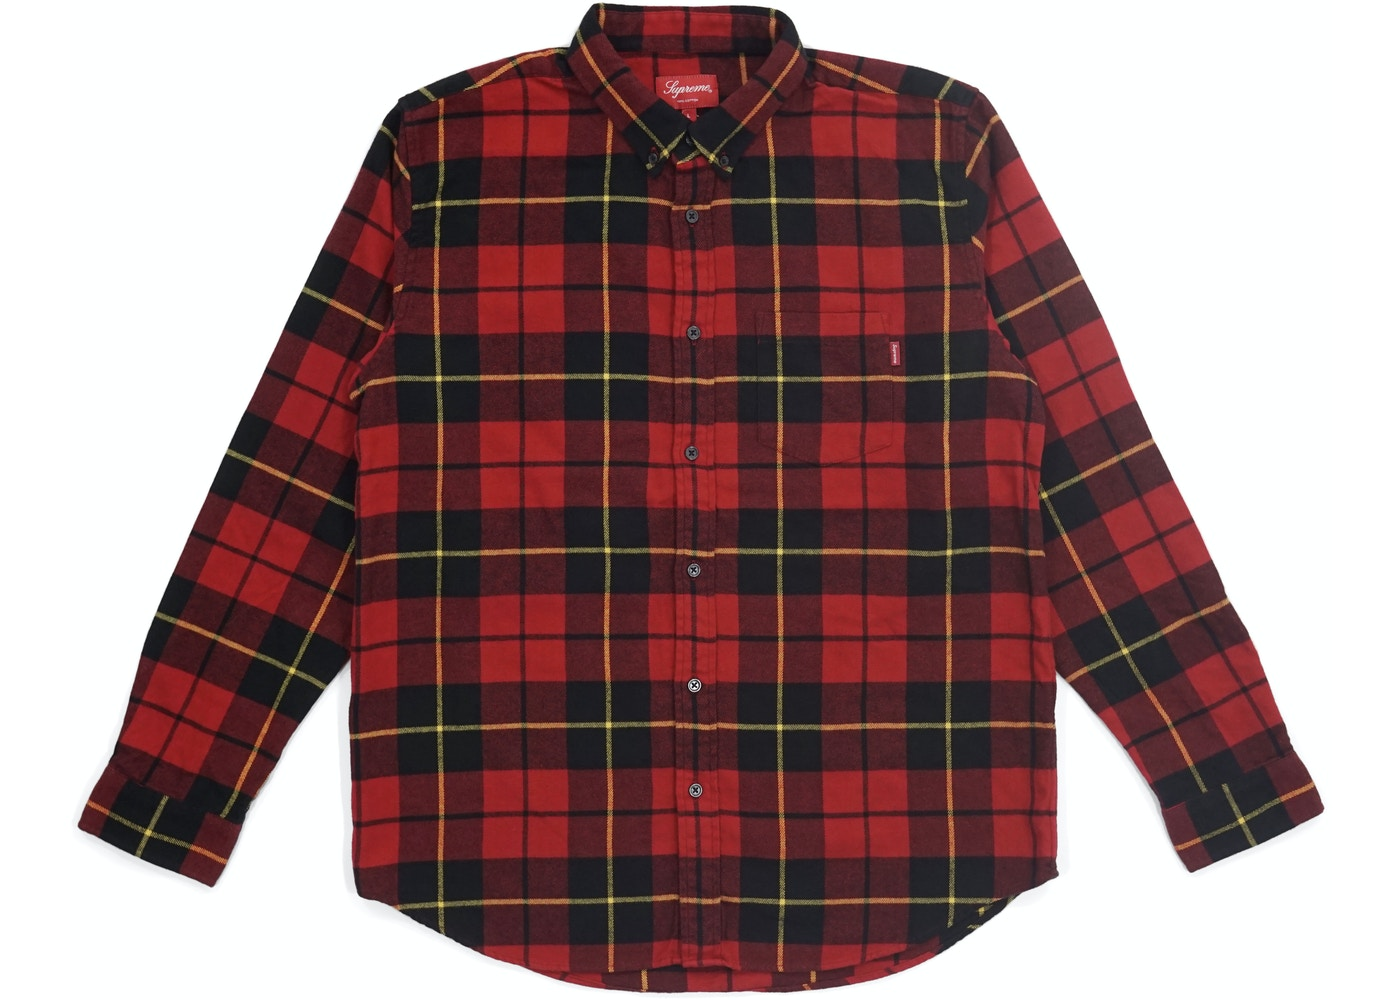 84a5b1627cb Supreme Tartan L S Flannel Shirt Red - FW18